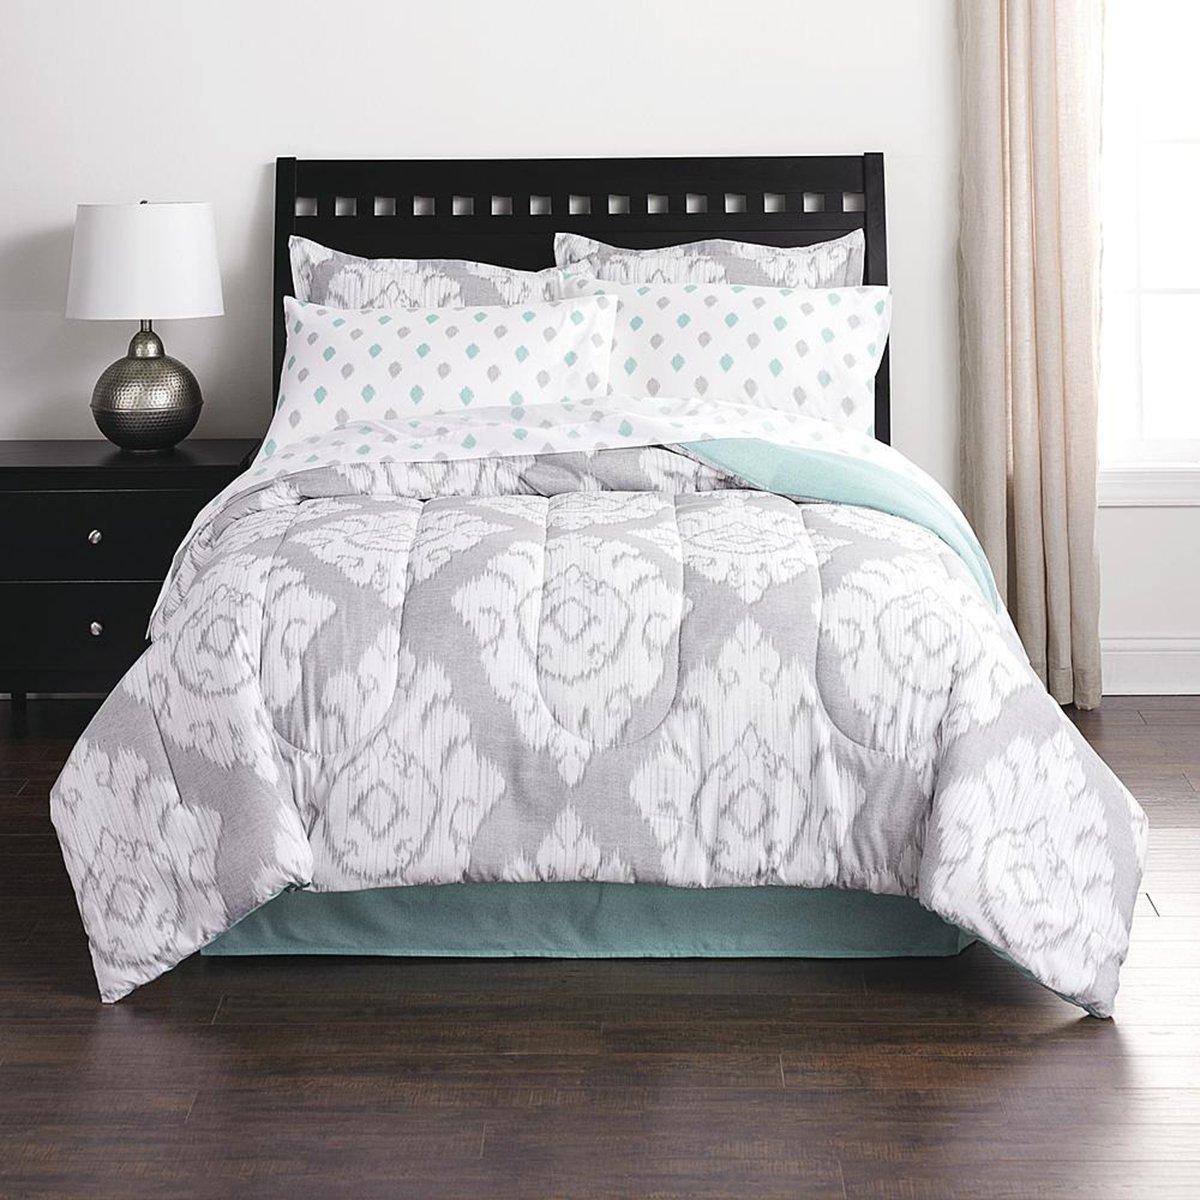 Amazon Com Gray White Ikat Comforter Set Twin Size 6 Pieces Bedding